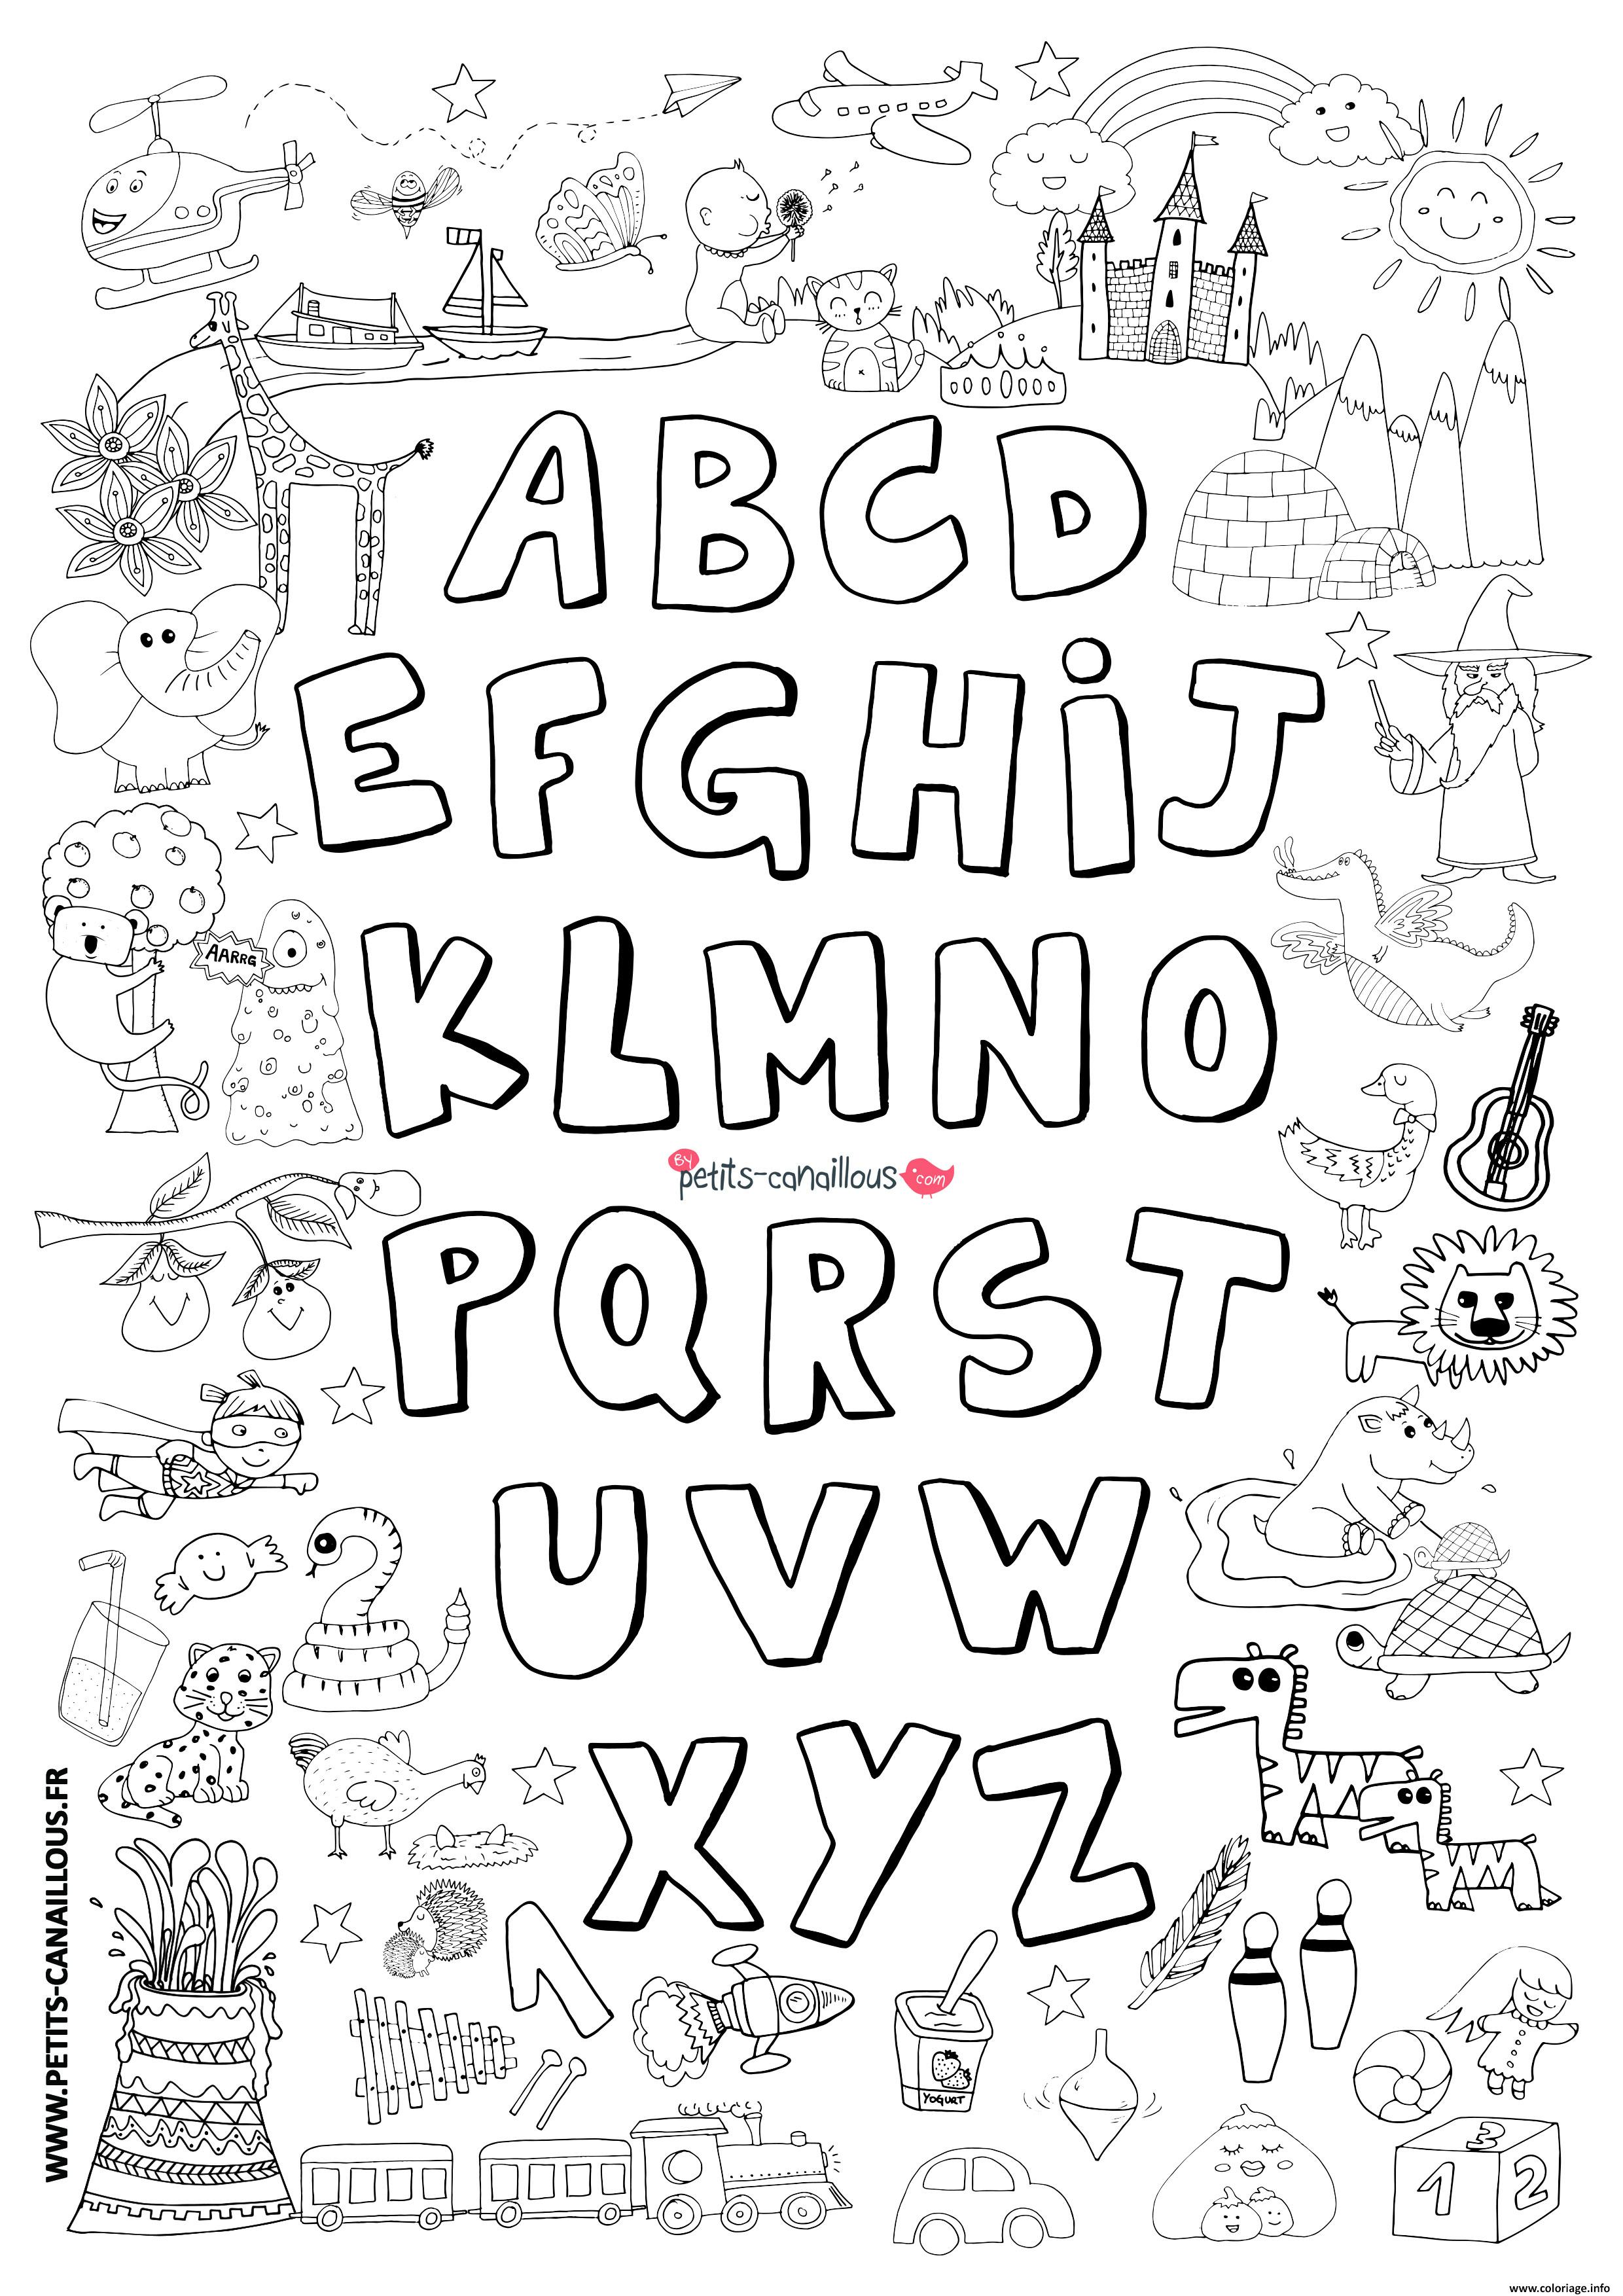 Coloriage Abecedaire Avec Dessins Dessin Alphabet A Imprimer